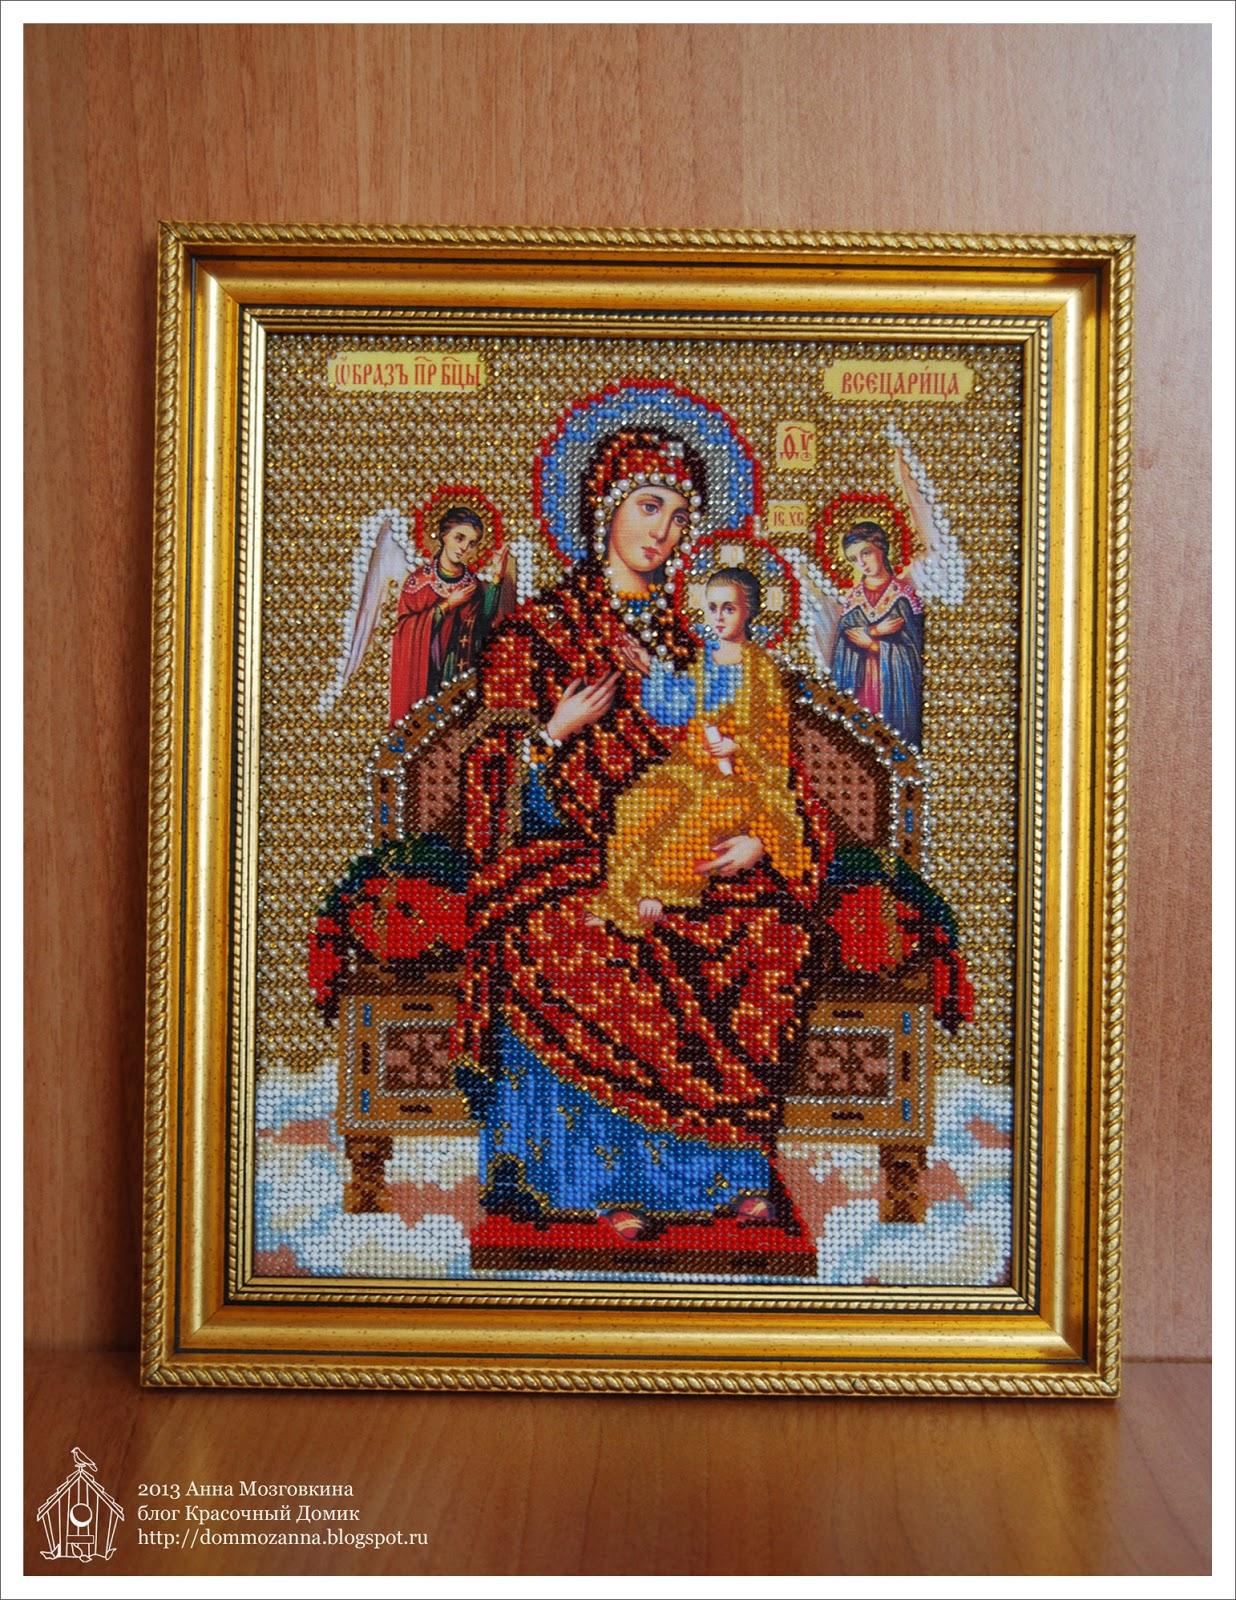 Богородица вышивка